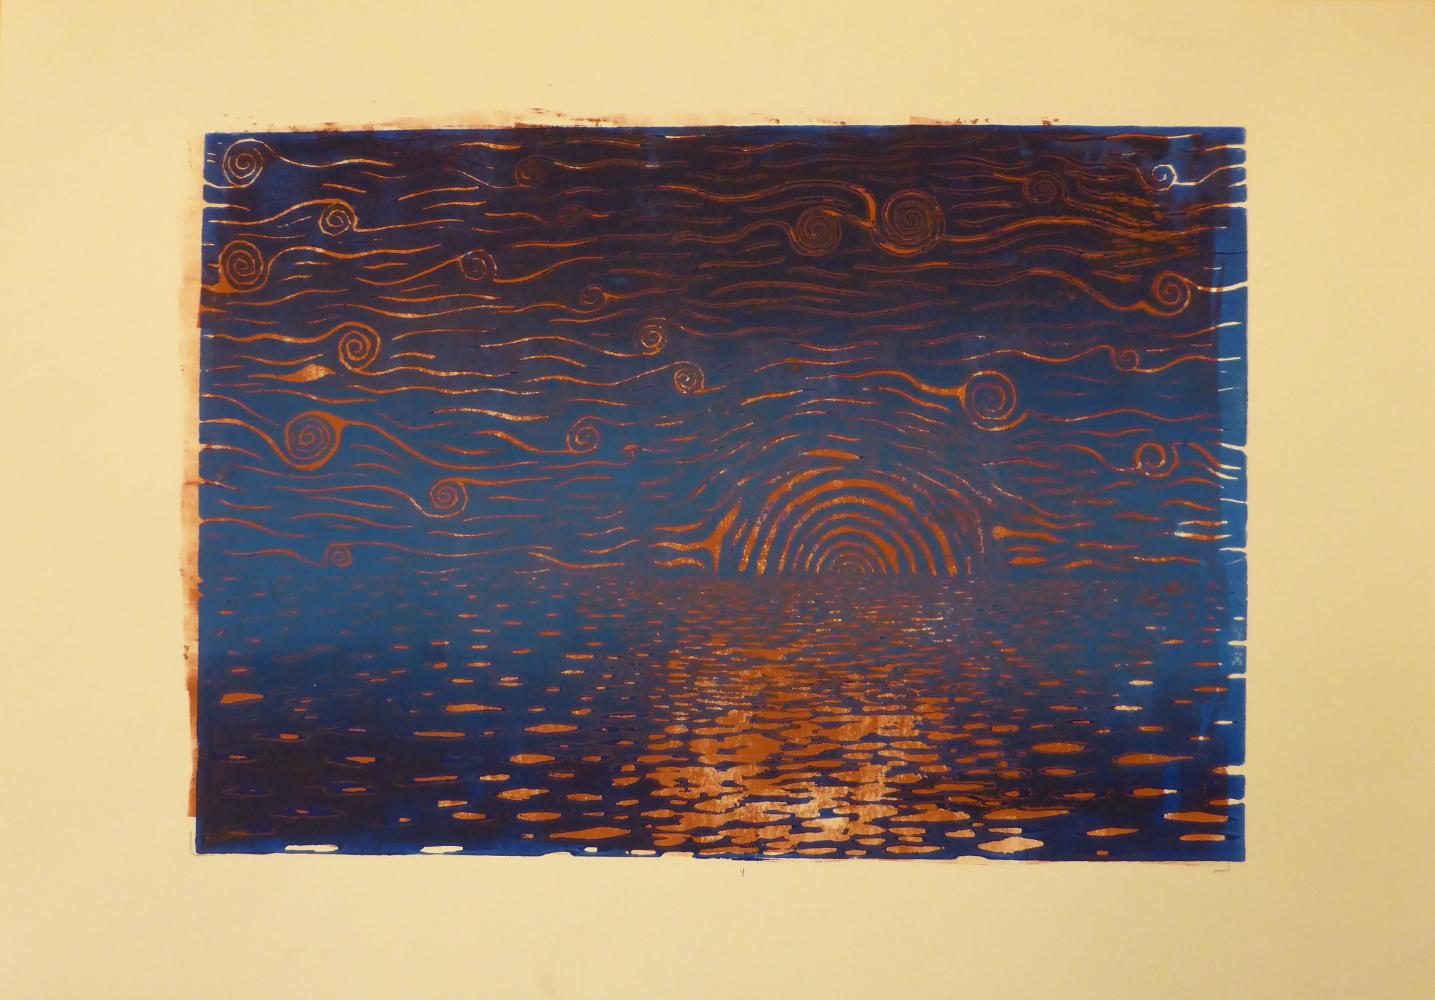 """Starry night II"", 2018, linocut on paper, 42 x 30 cm"